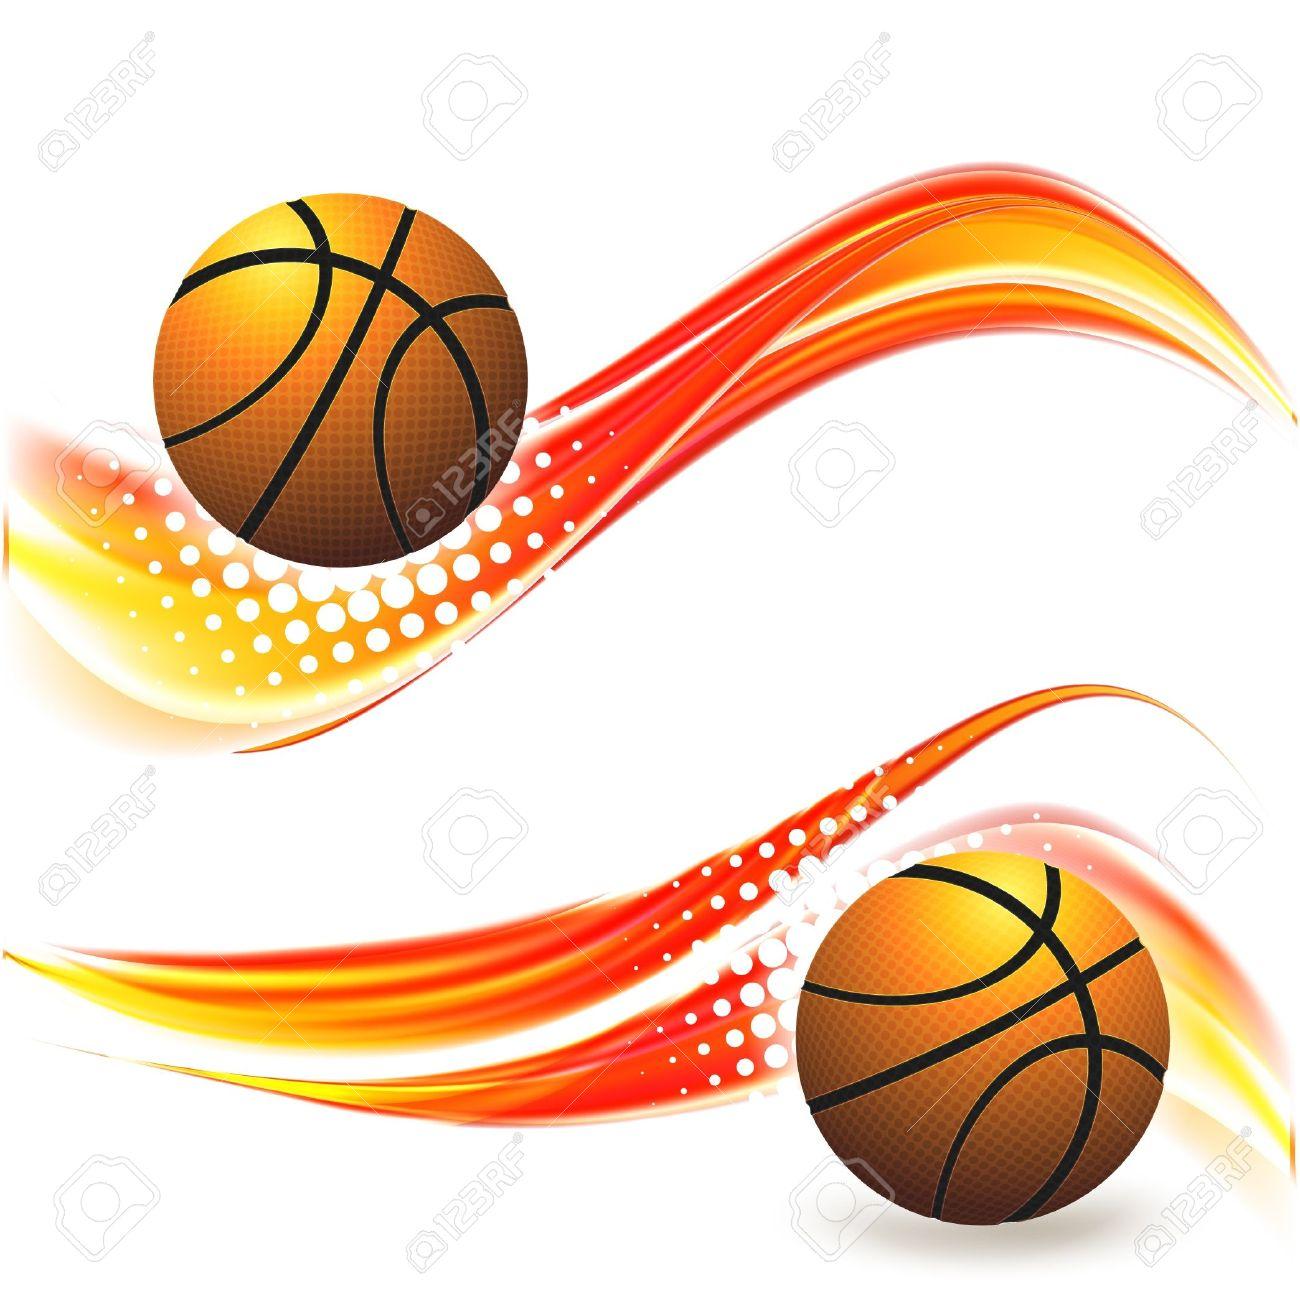 basketball advertising poster. Stock Vector - 9842659